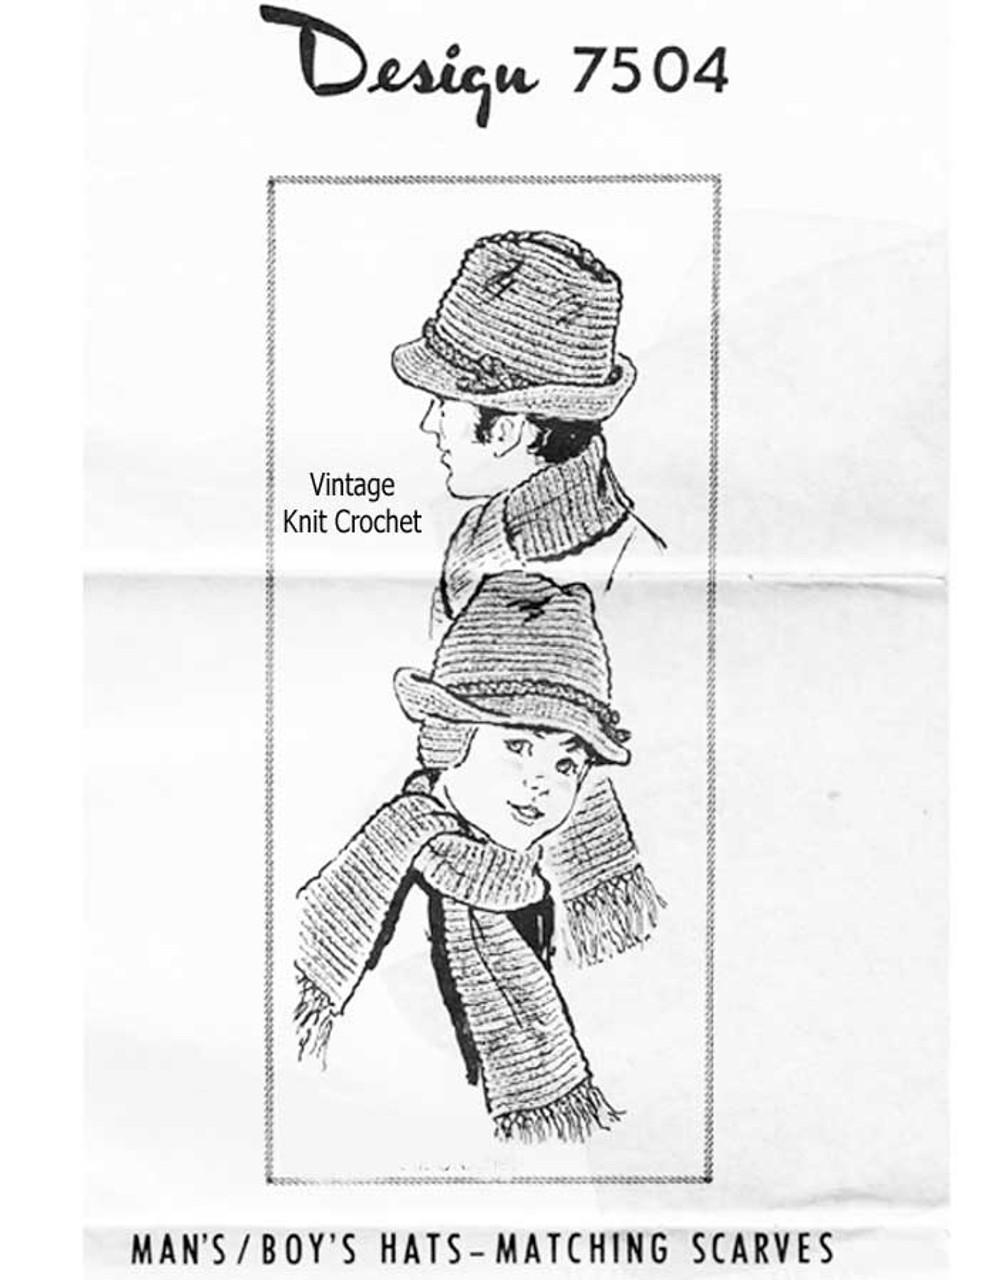 Mans Brimmed Crochet Hat Pattern, Design 7504